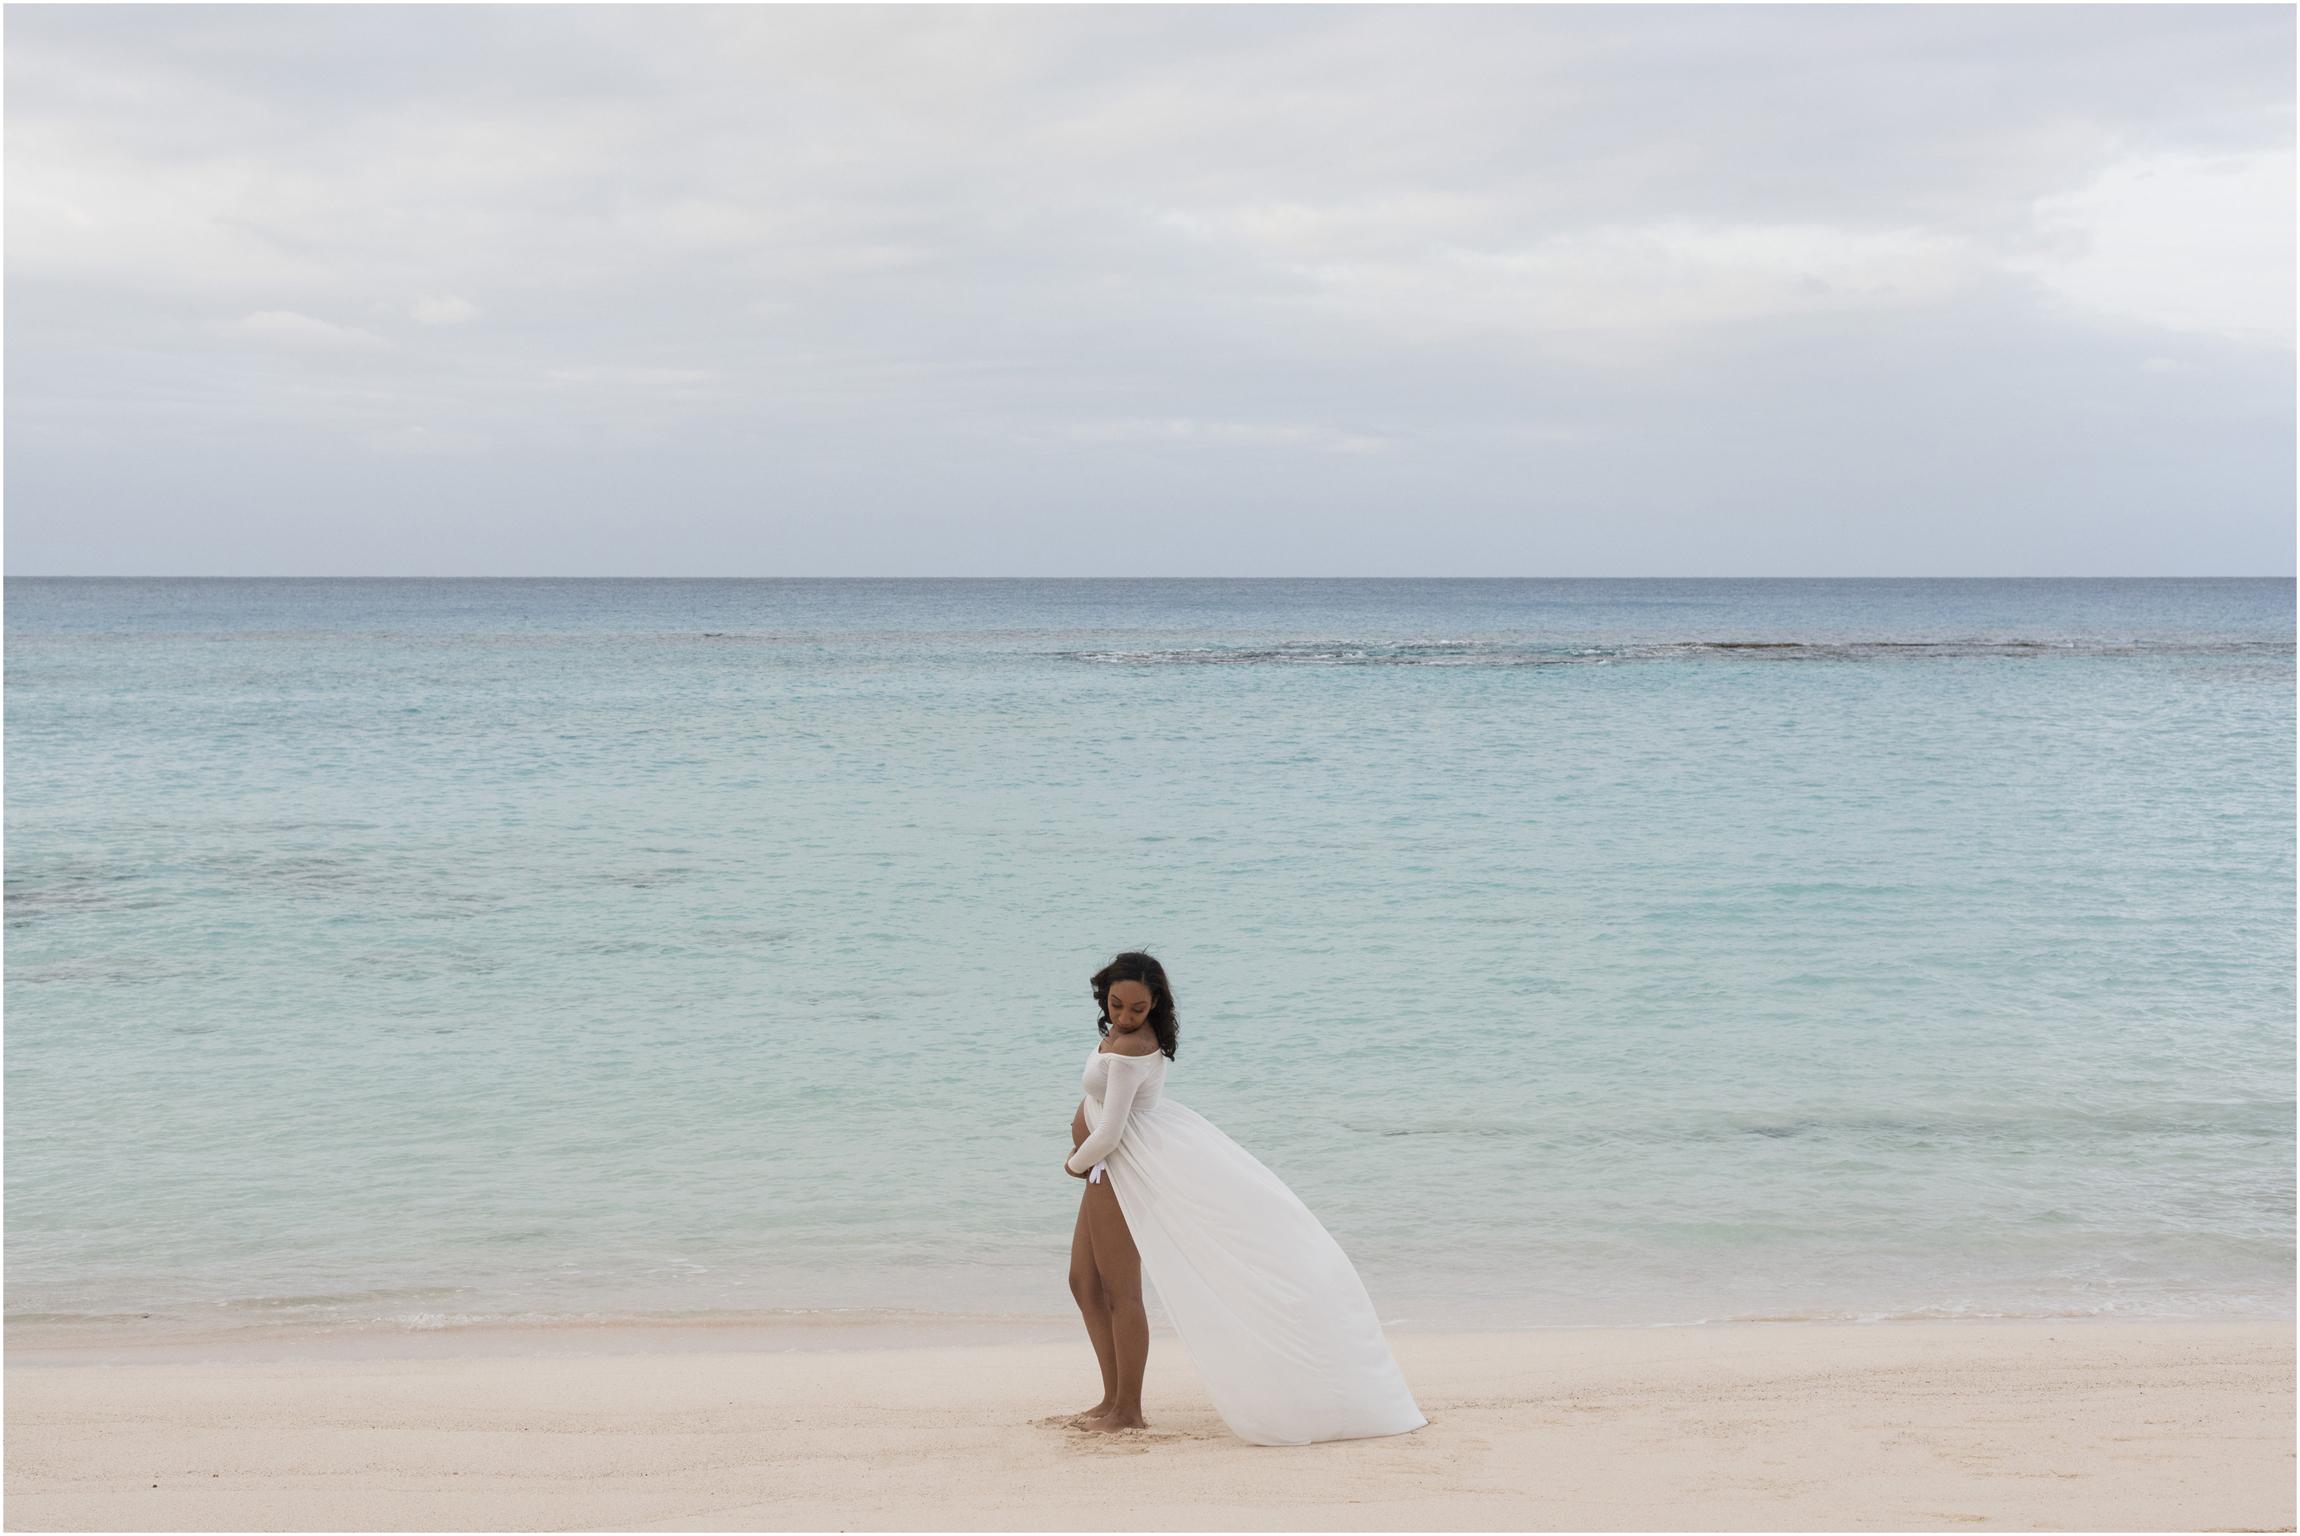 ©FianderFoto_Bermuda Maternity Photographer_Church Bay Beach_Tiffany_005.jpg